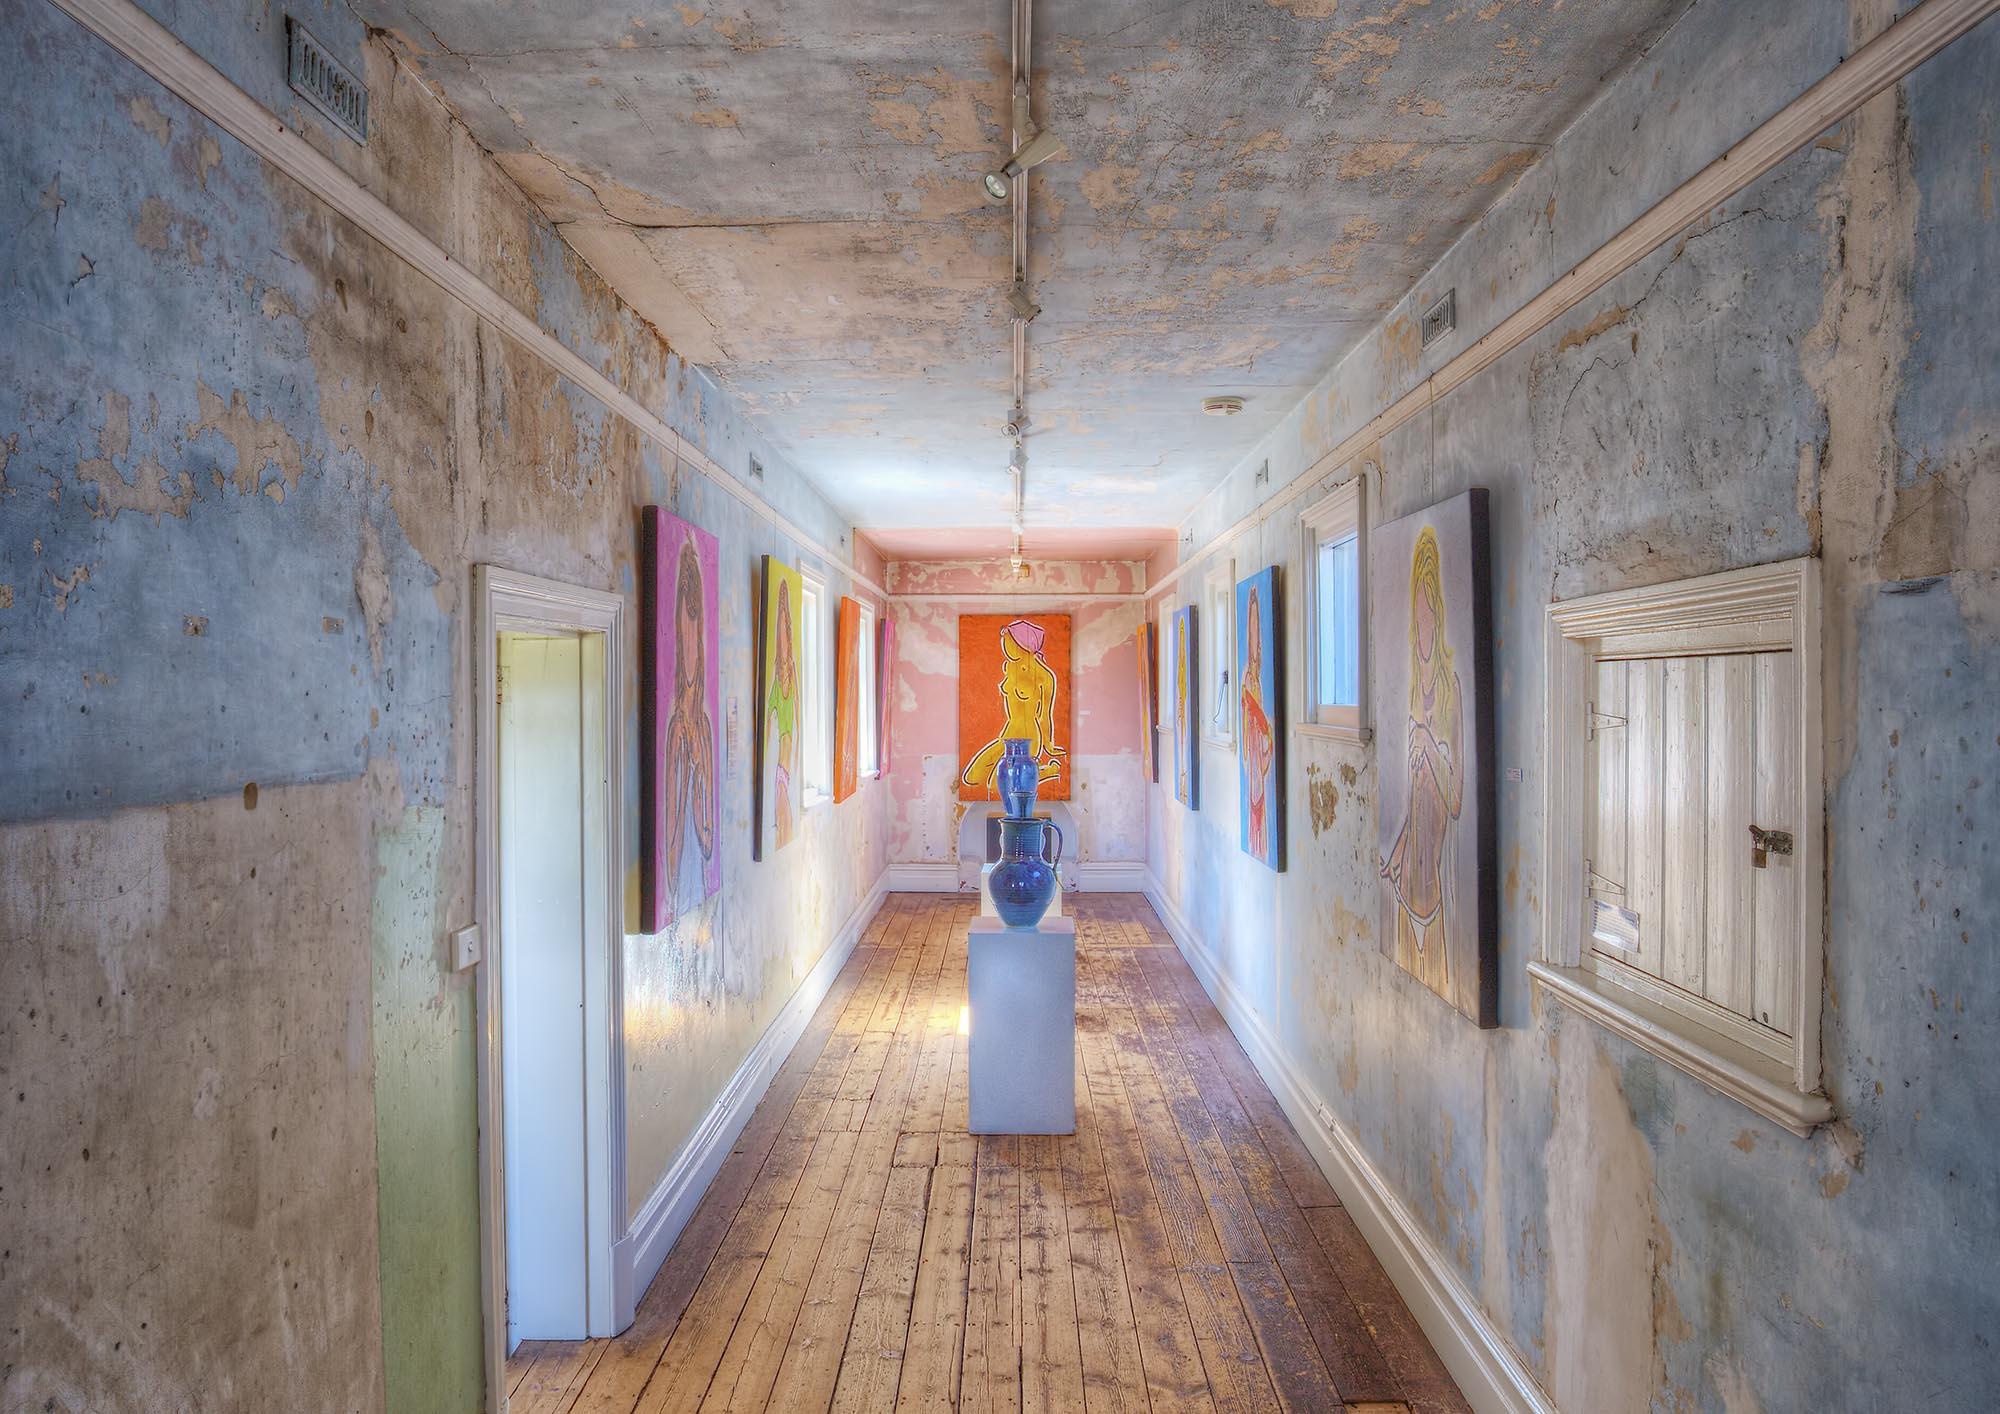 convent gallery.jpg